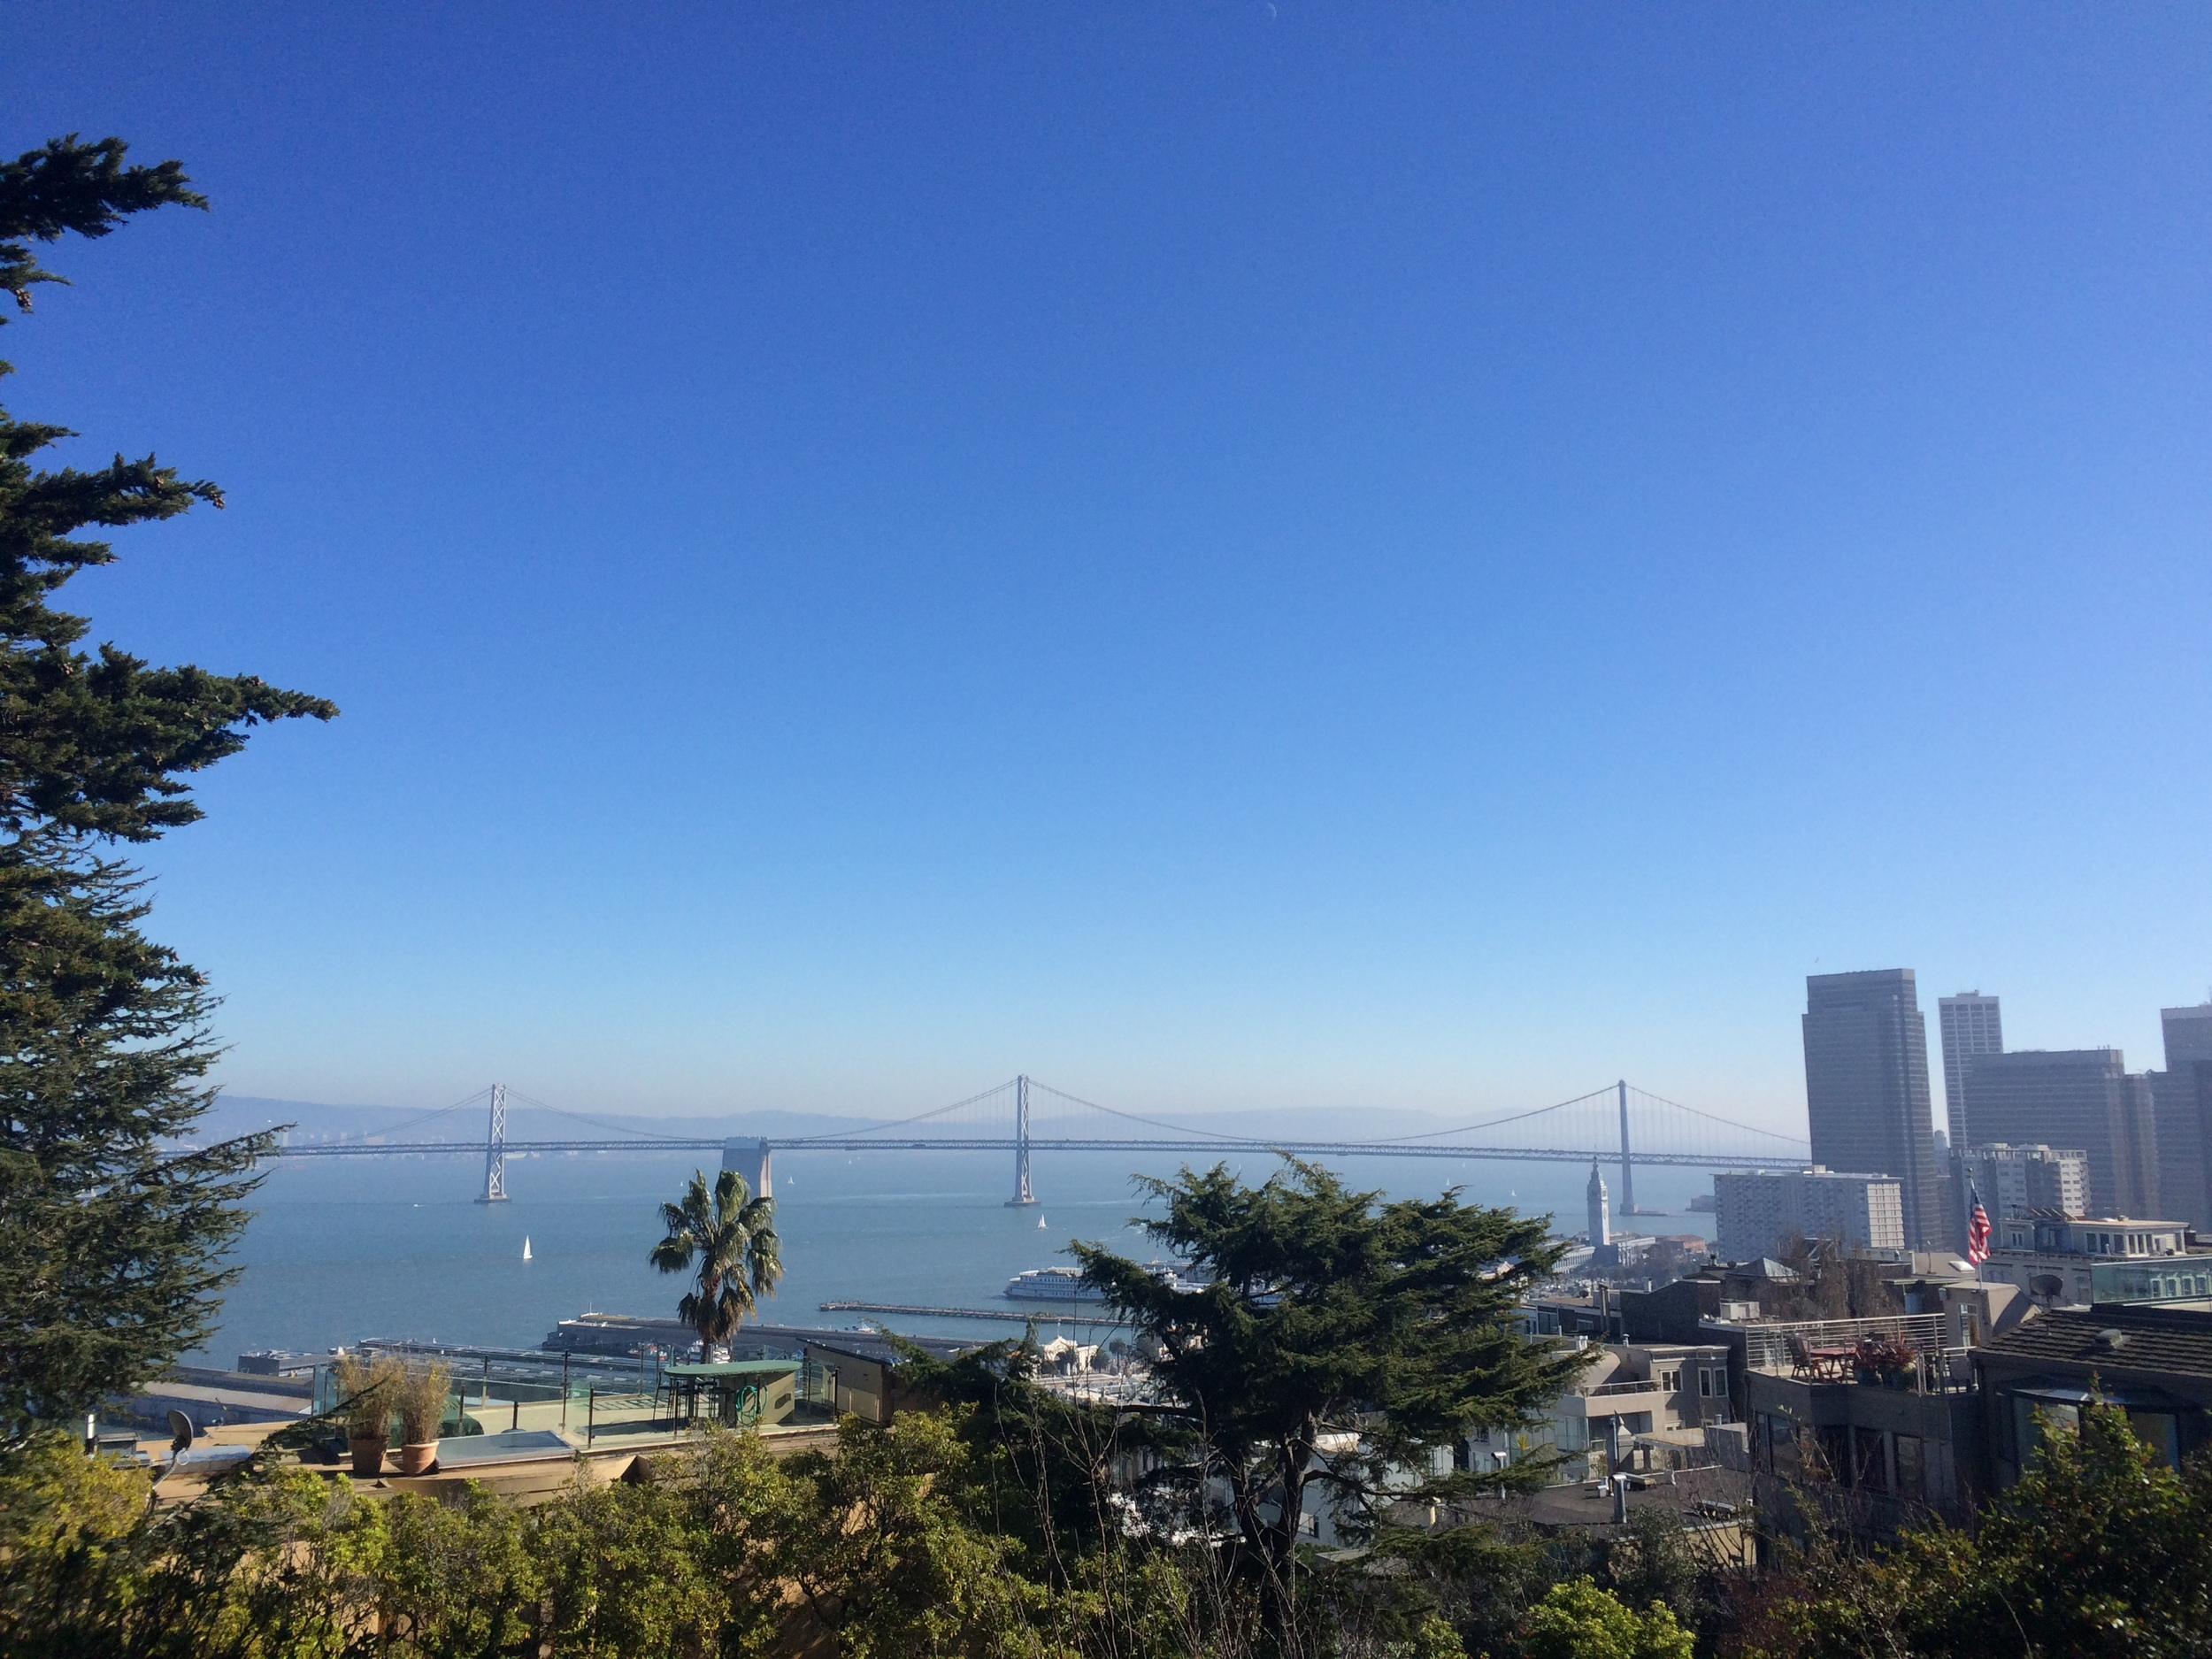 Bay Bridge view from Coit Tower // San Francisco, California